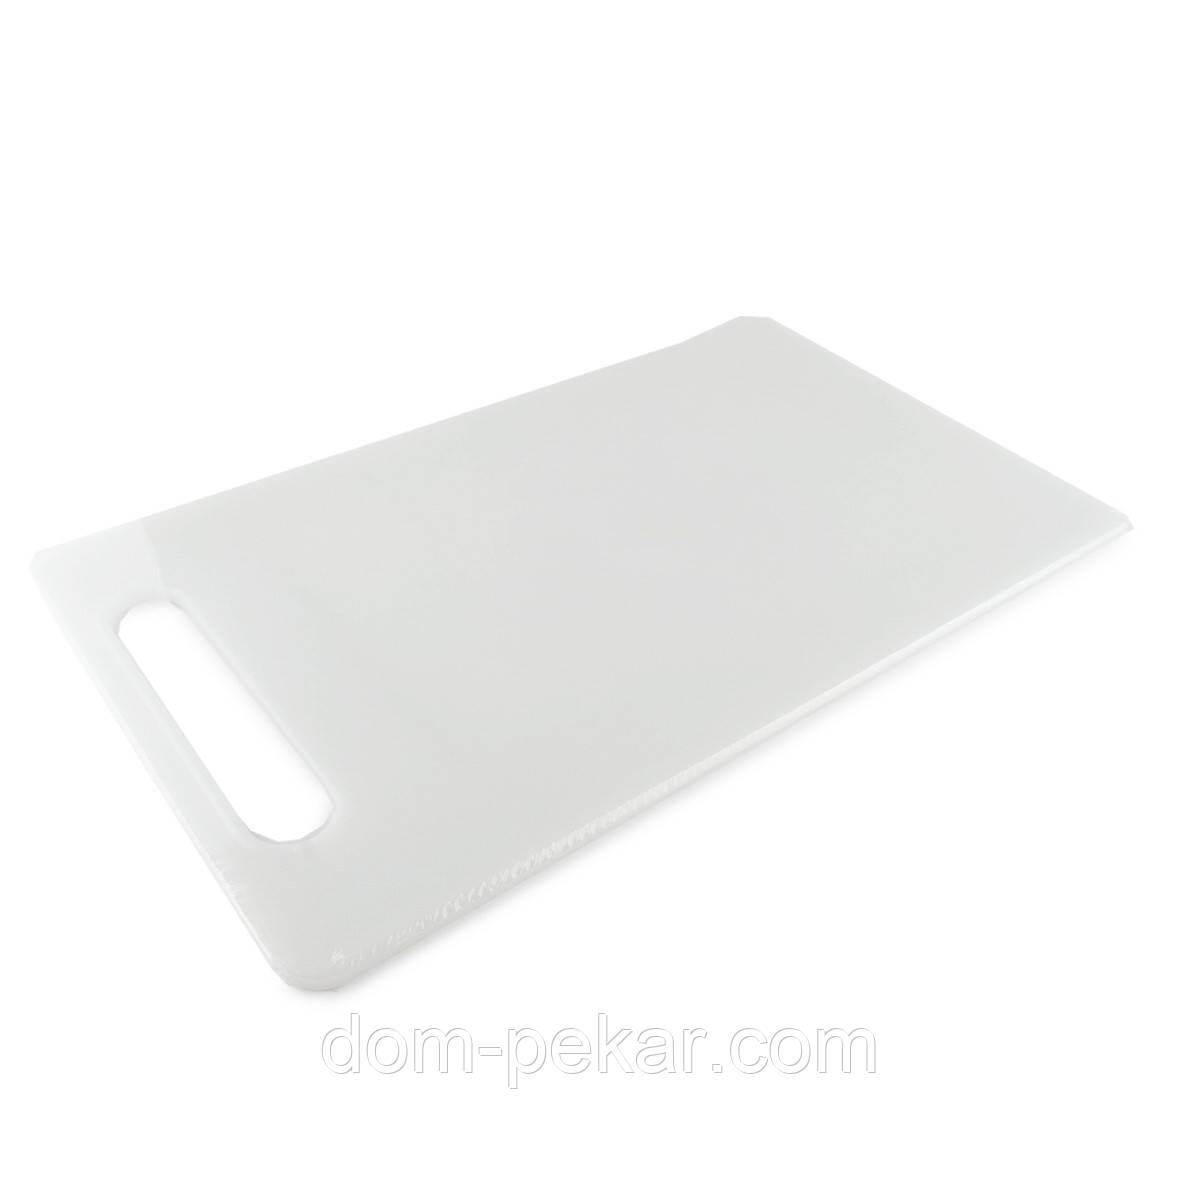 Доска разделочная пластик 46*31,5*0,5 см